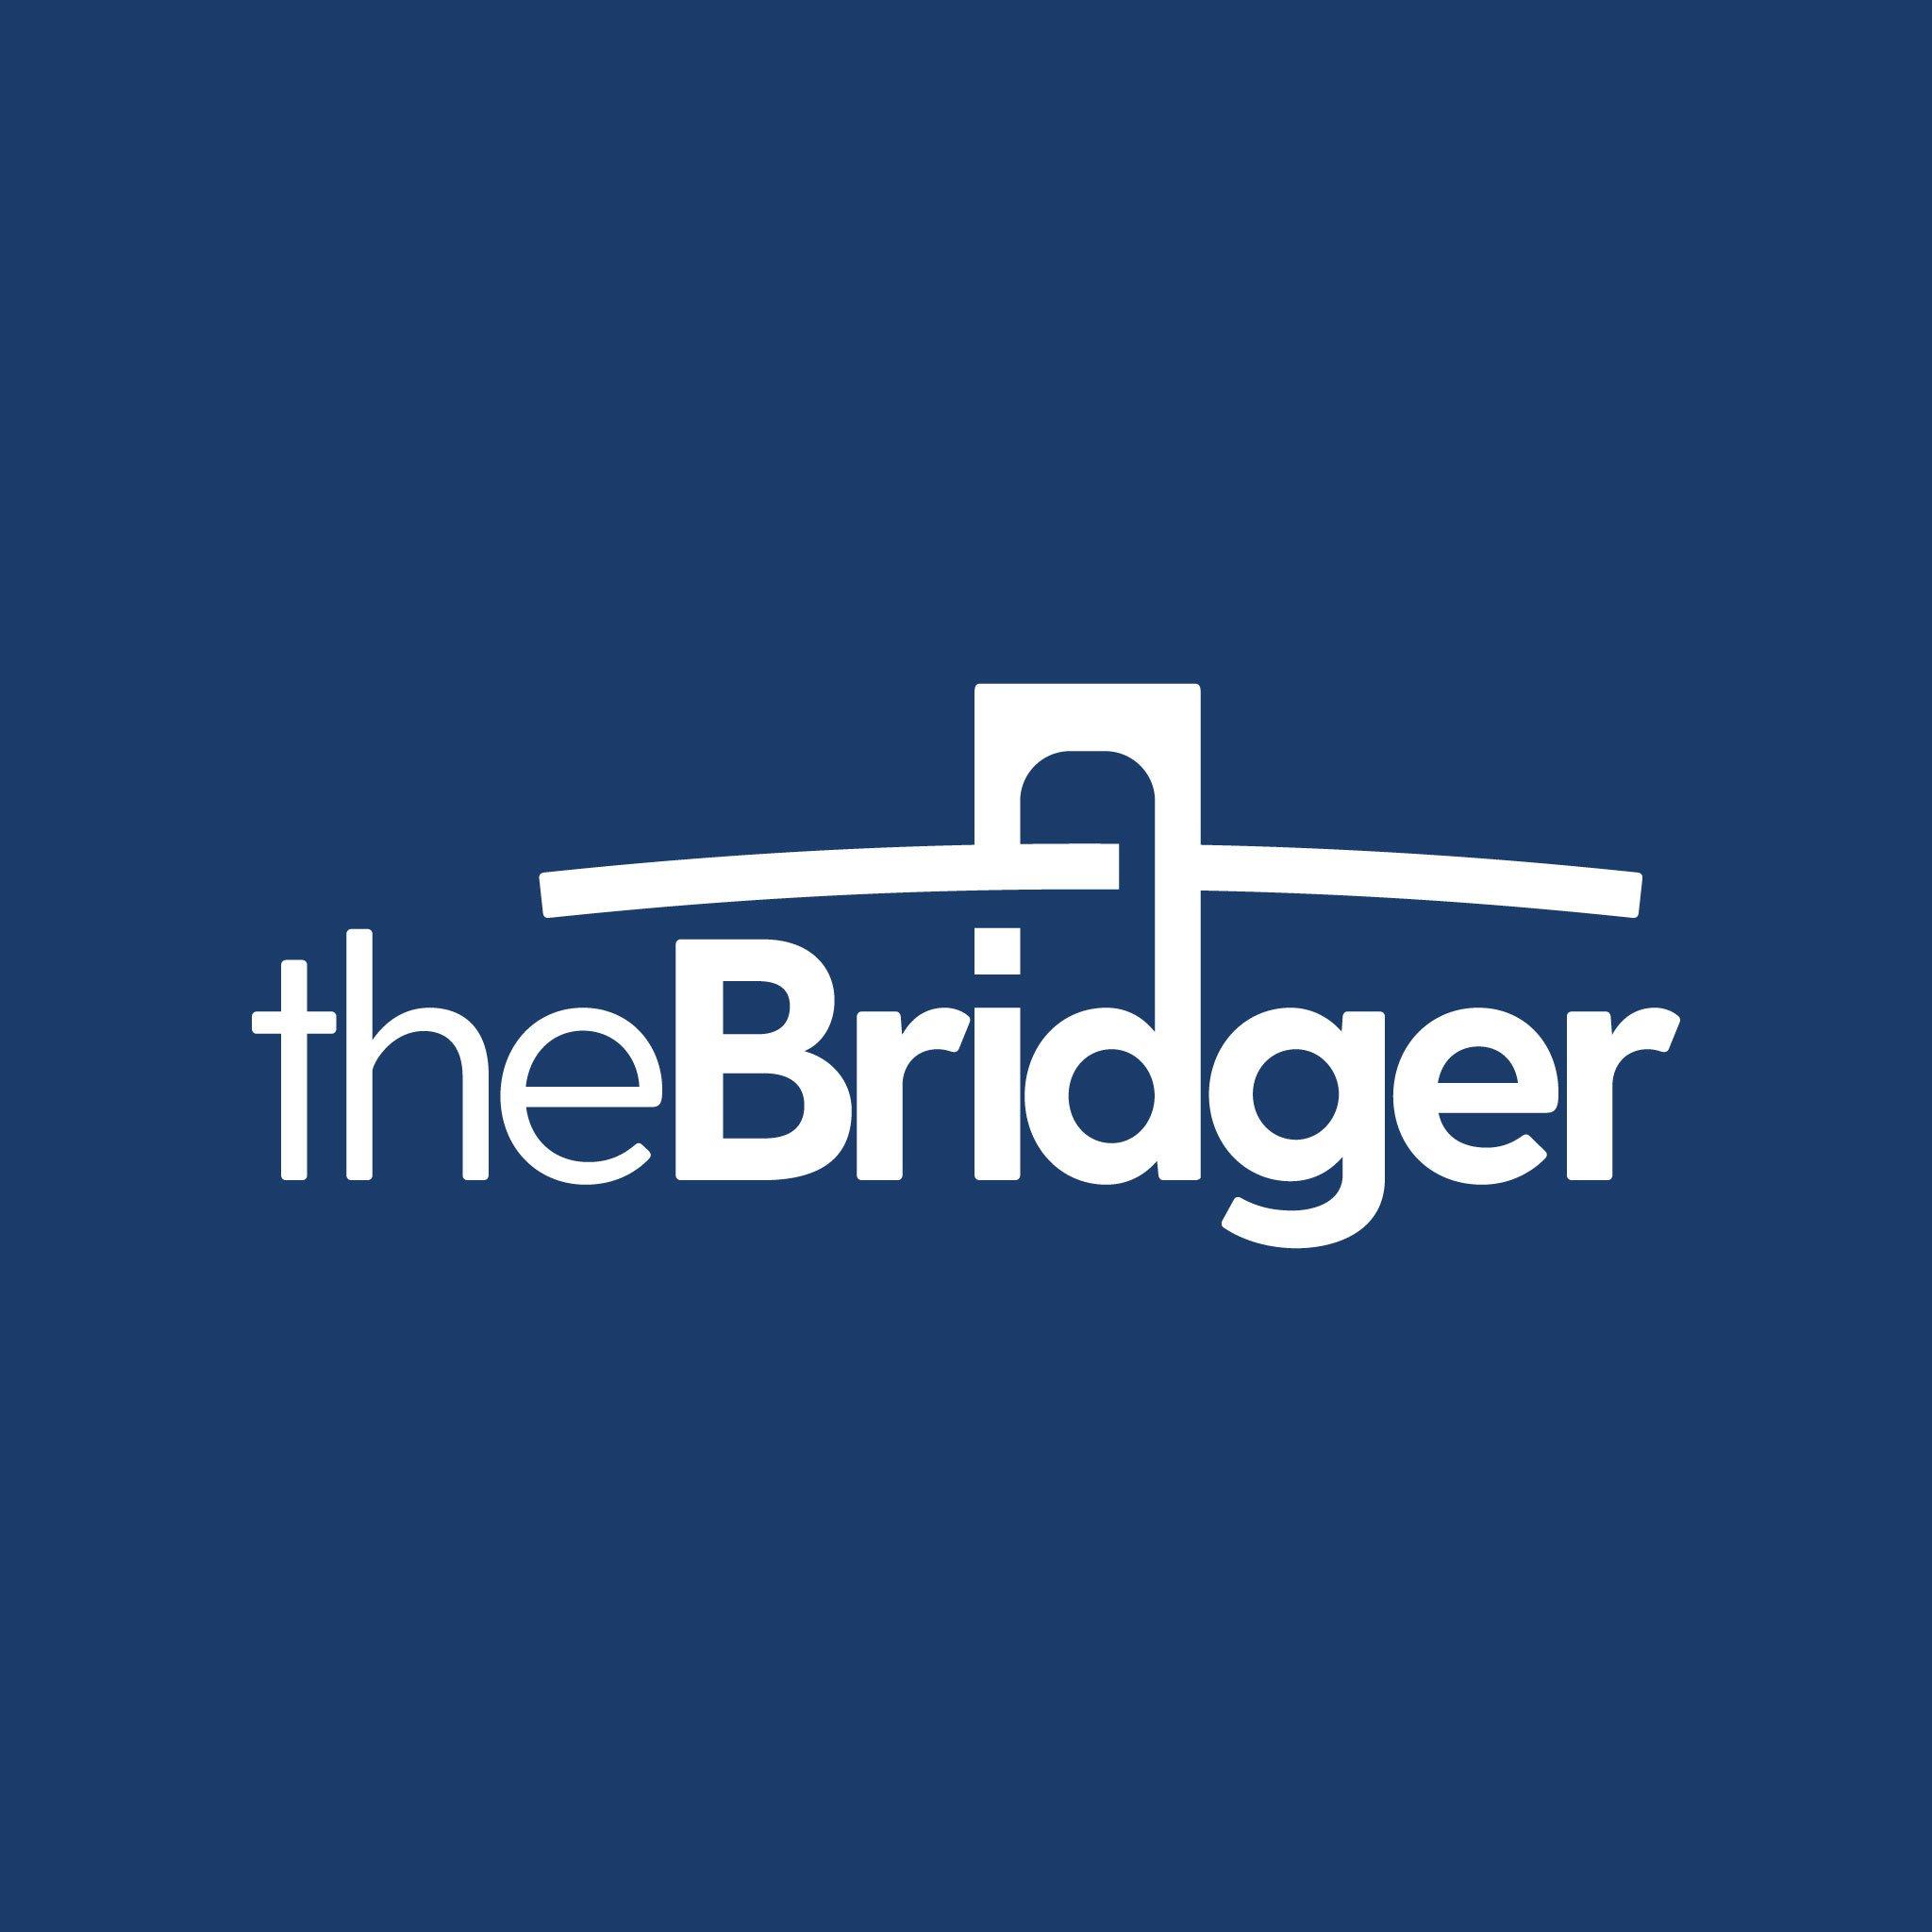 The Bridger